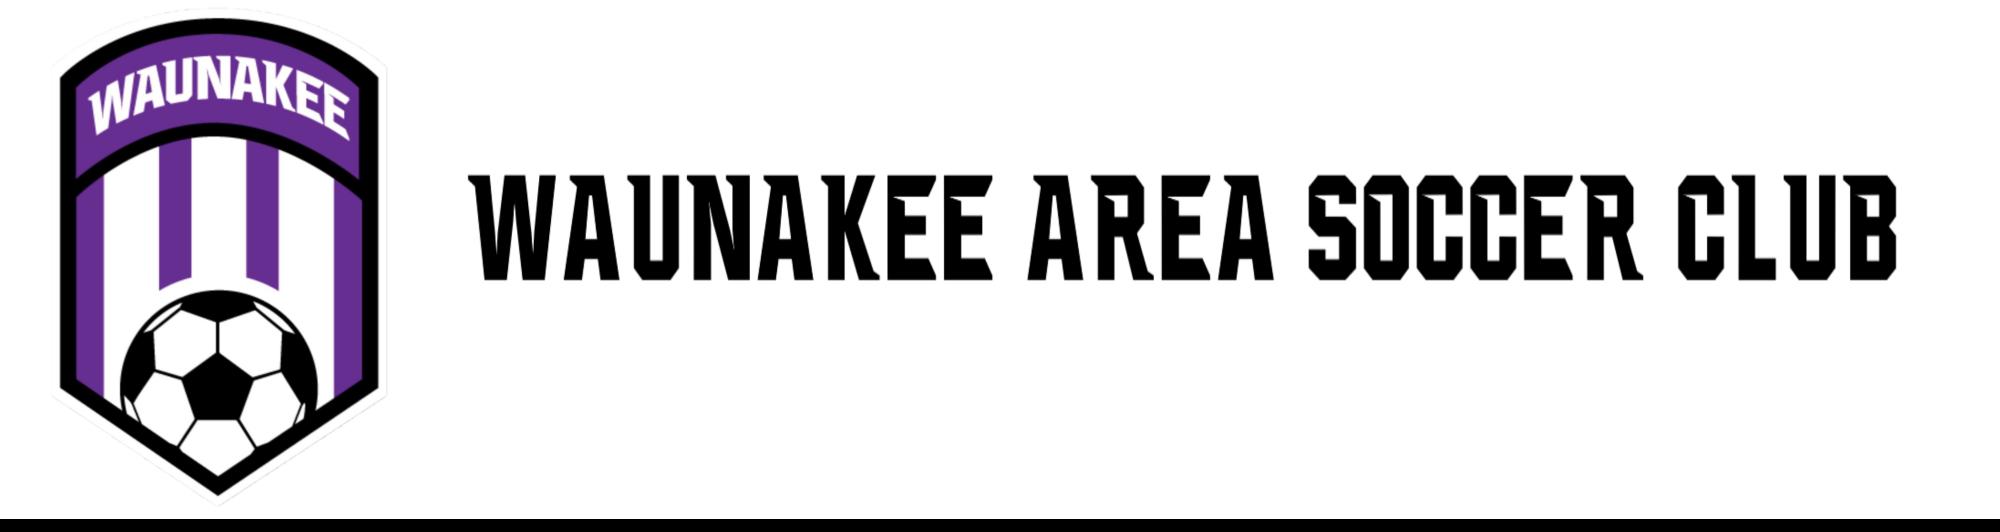 New wasc logo smaller v3